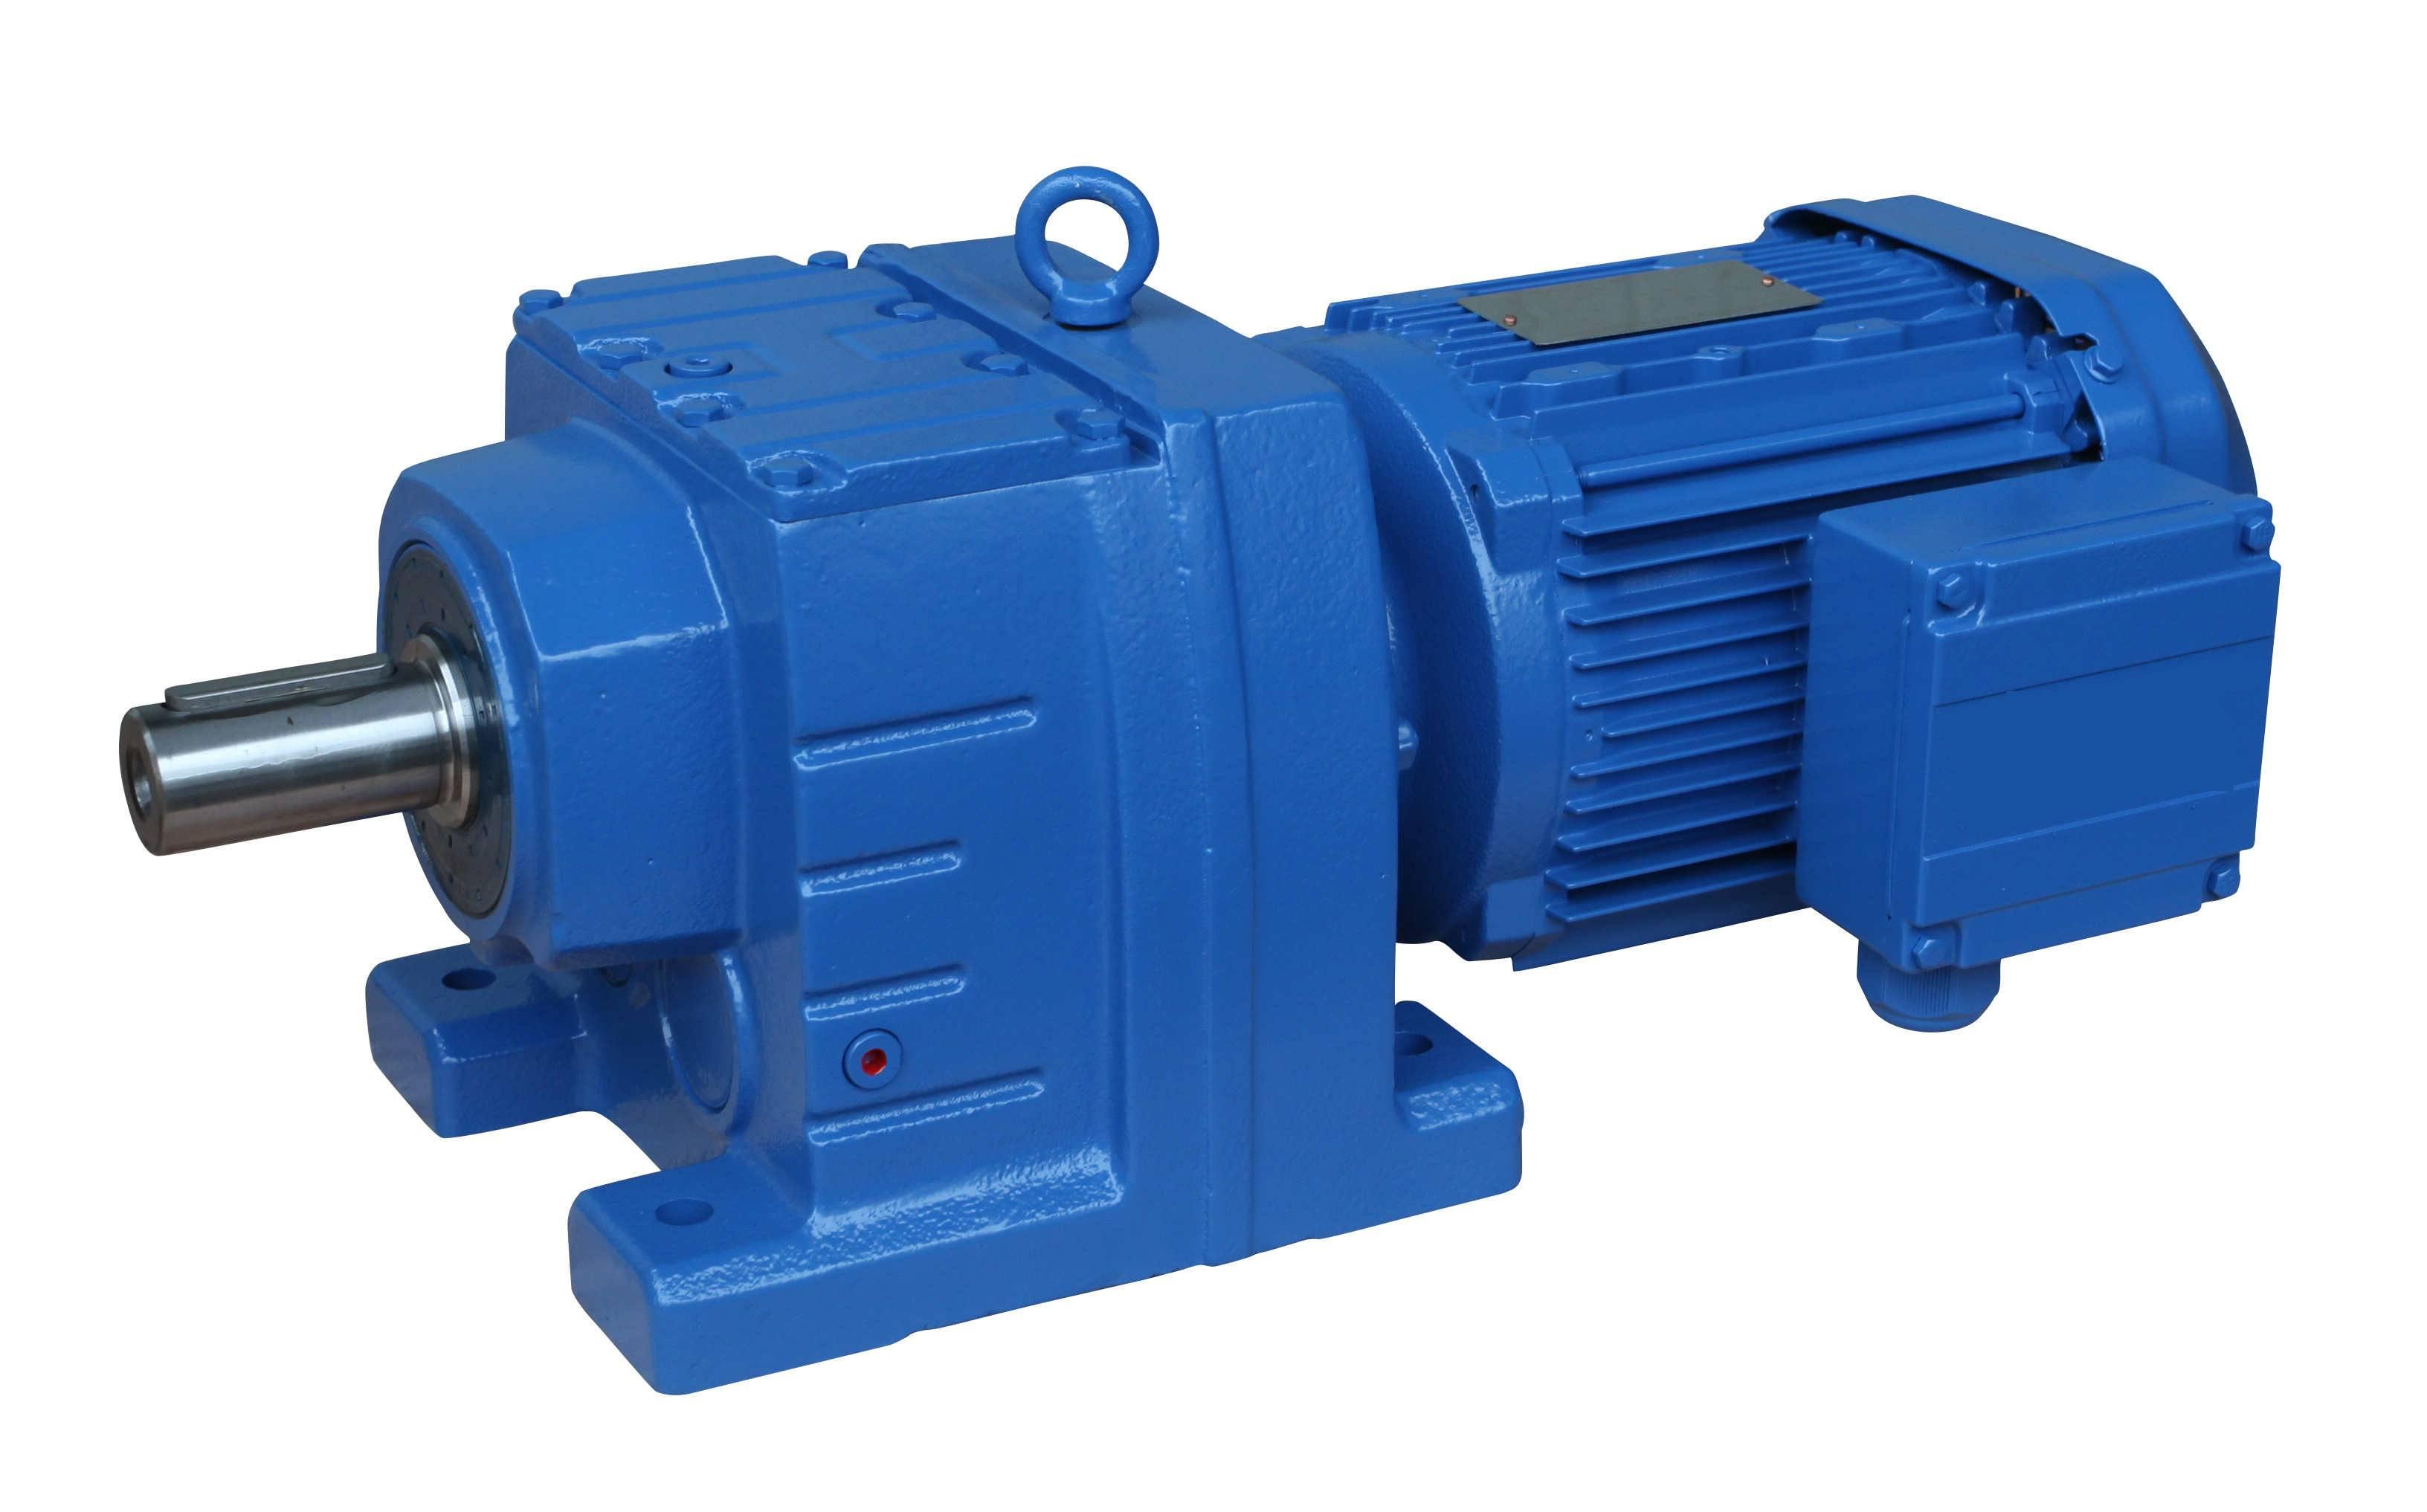 R17-R187 industrial in line coaxial helical gear unit motor